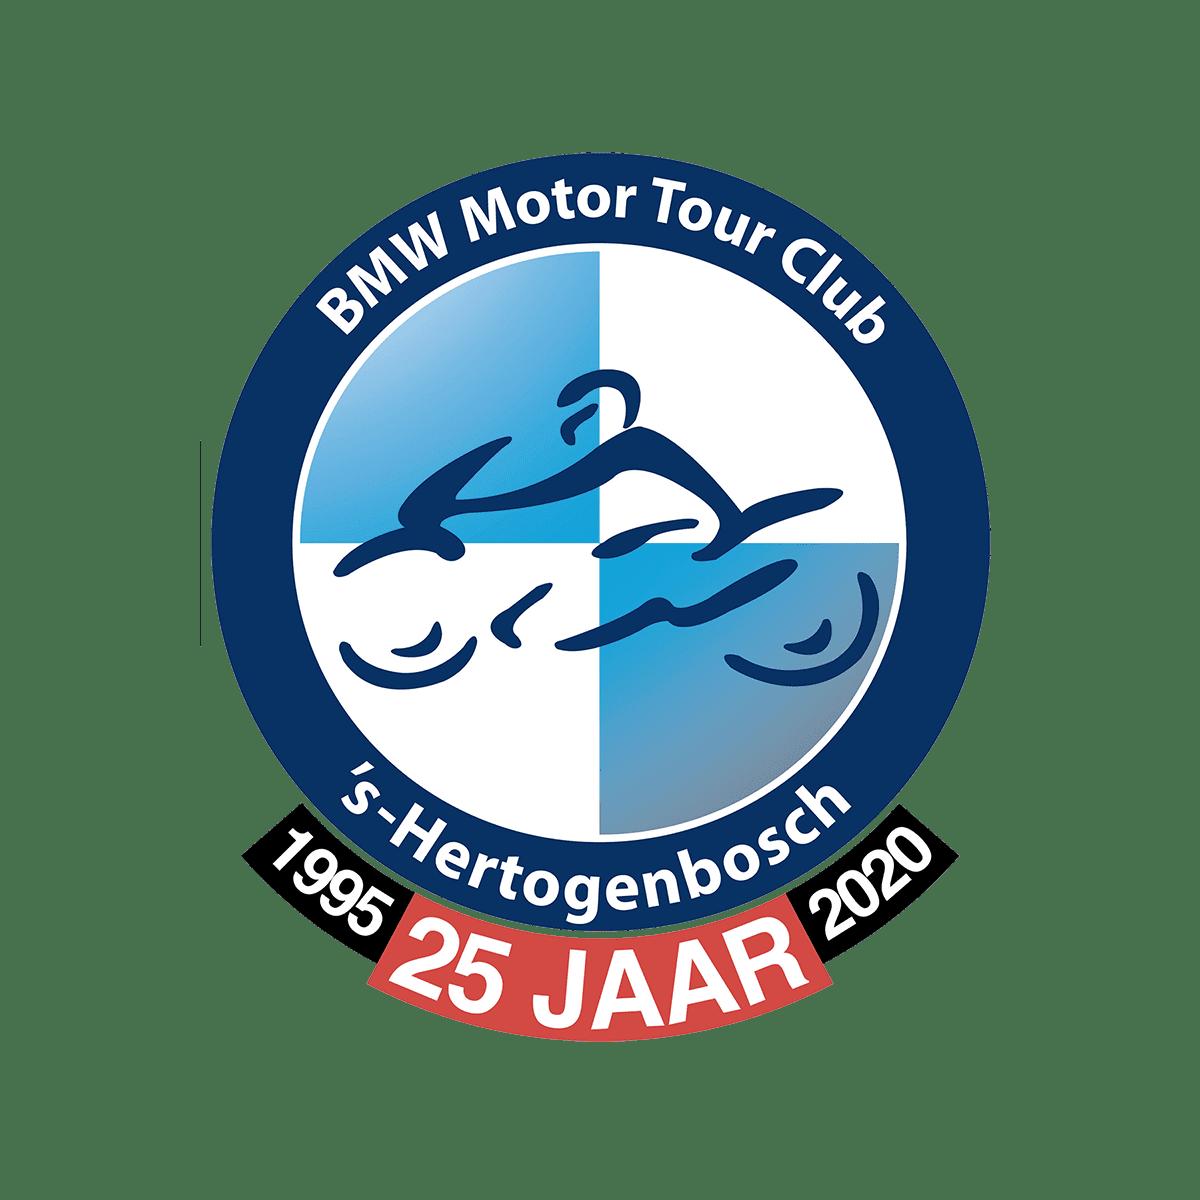 BMW Motorclub